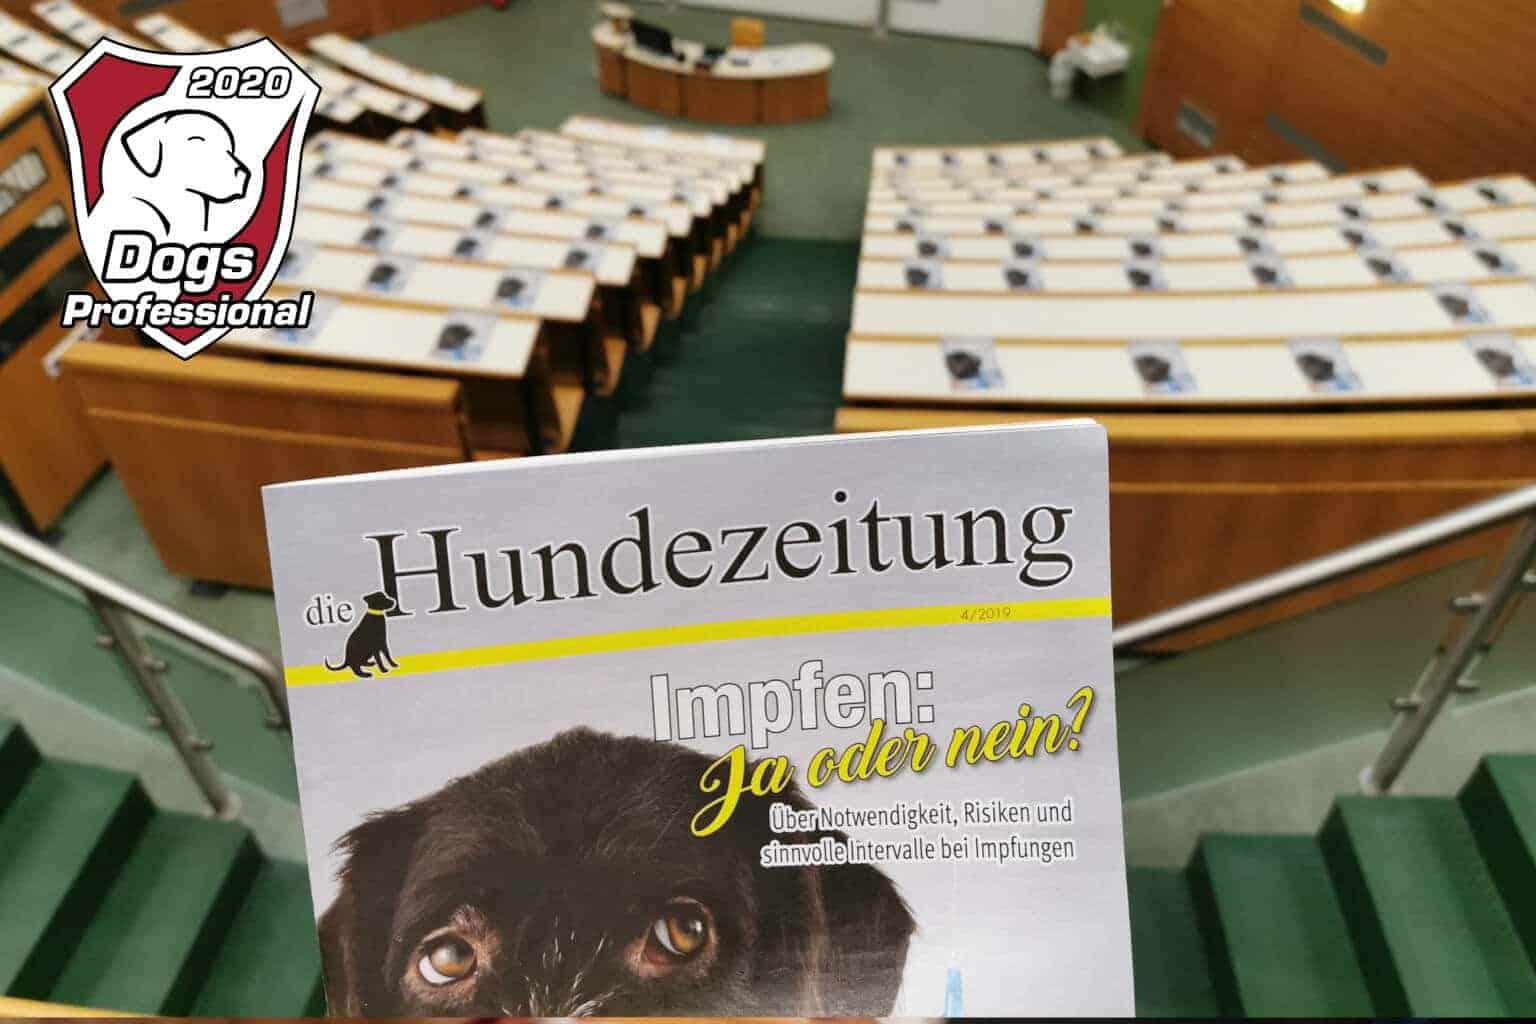 dogs professional 2020 vetmed uni wien die hundezeitung